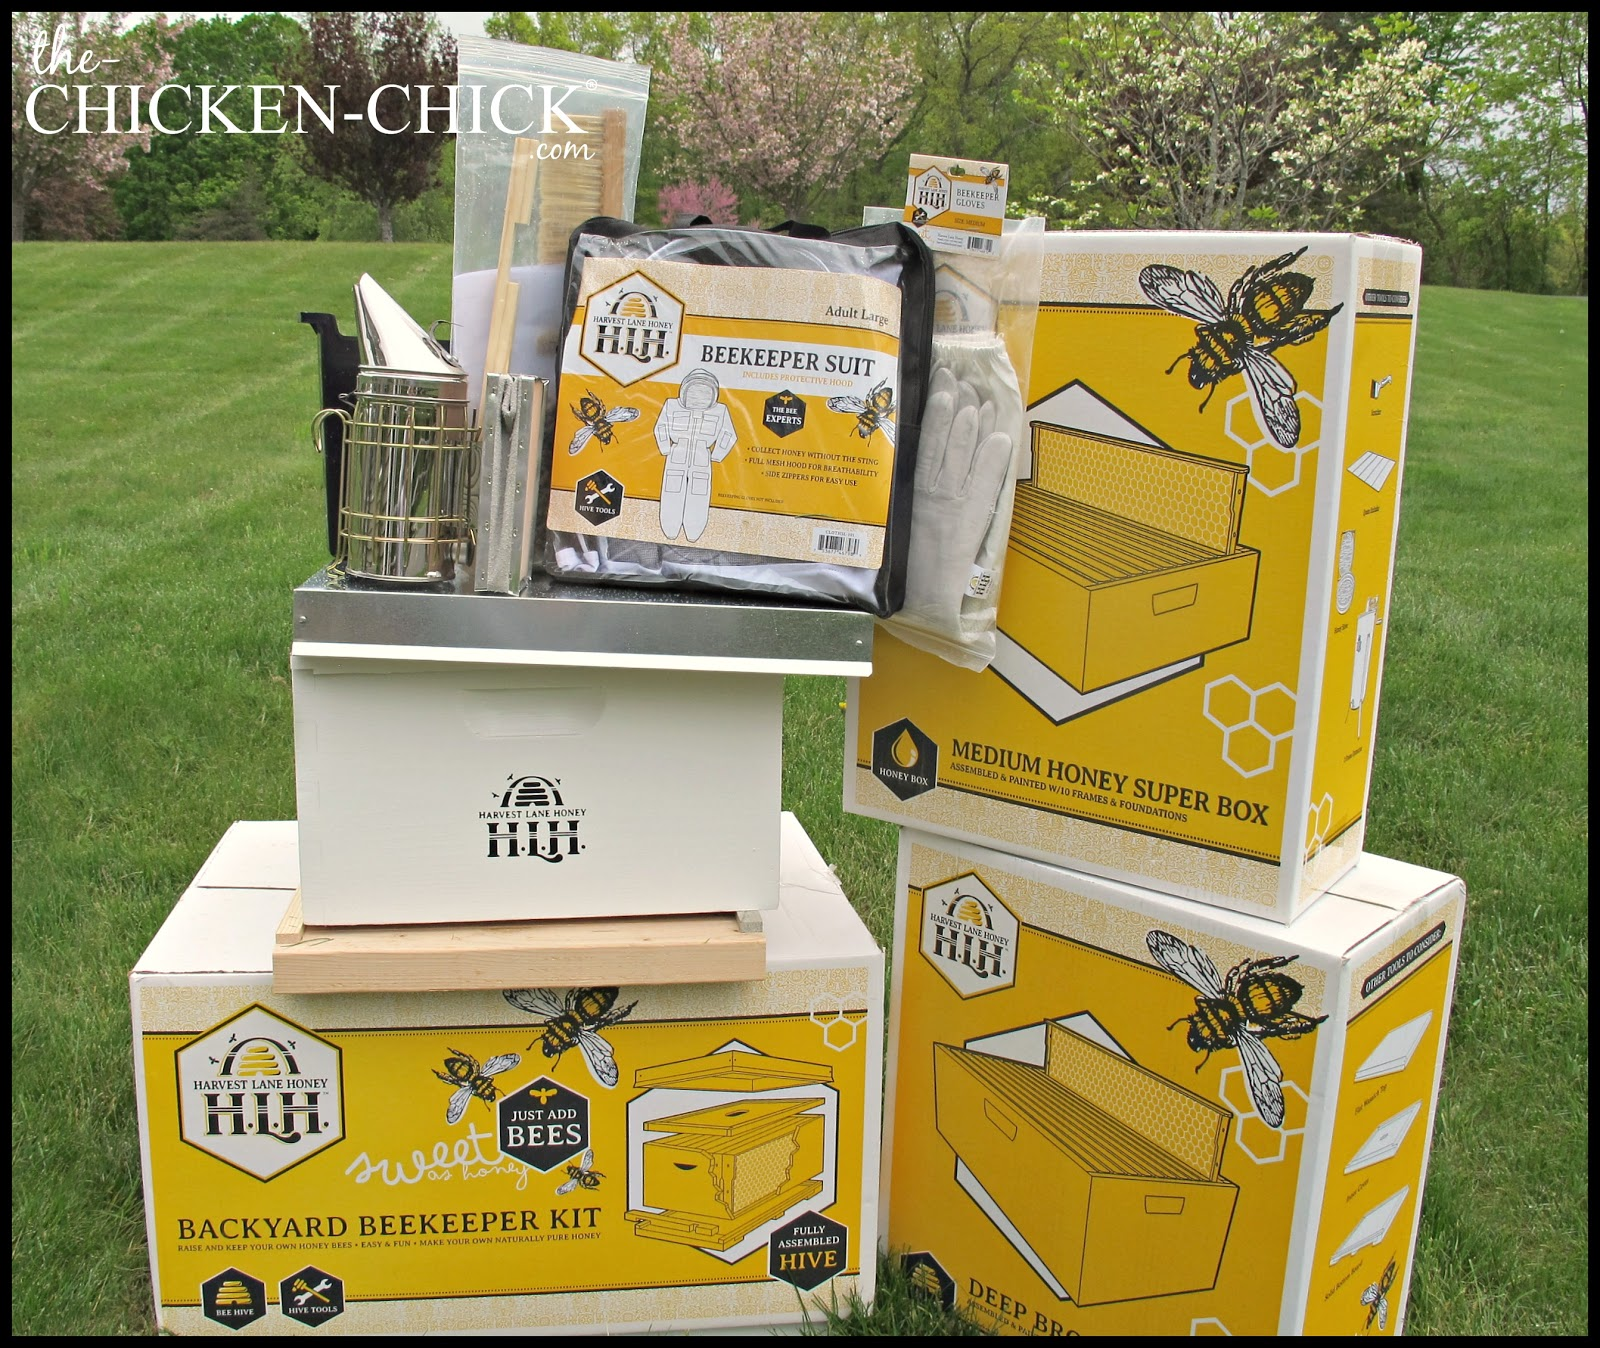 Genial Backyard Beekeeper Kit And Equipment.